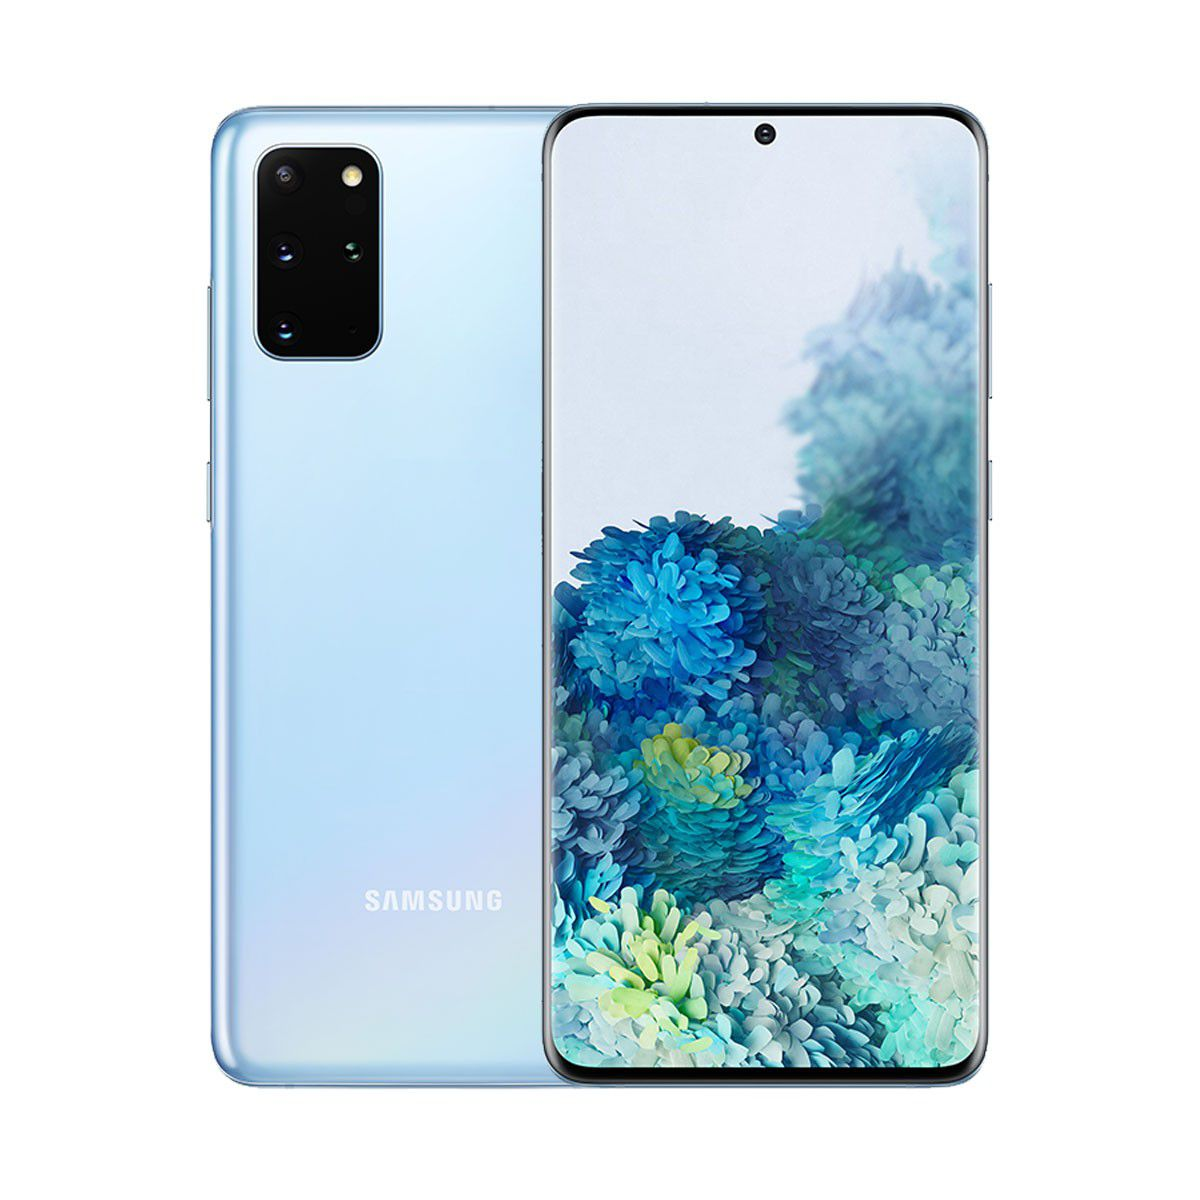 Samsung Galaxy S20+ LTE - Cloud Blue